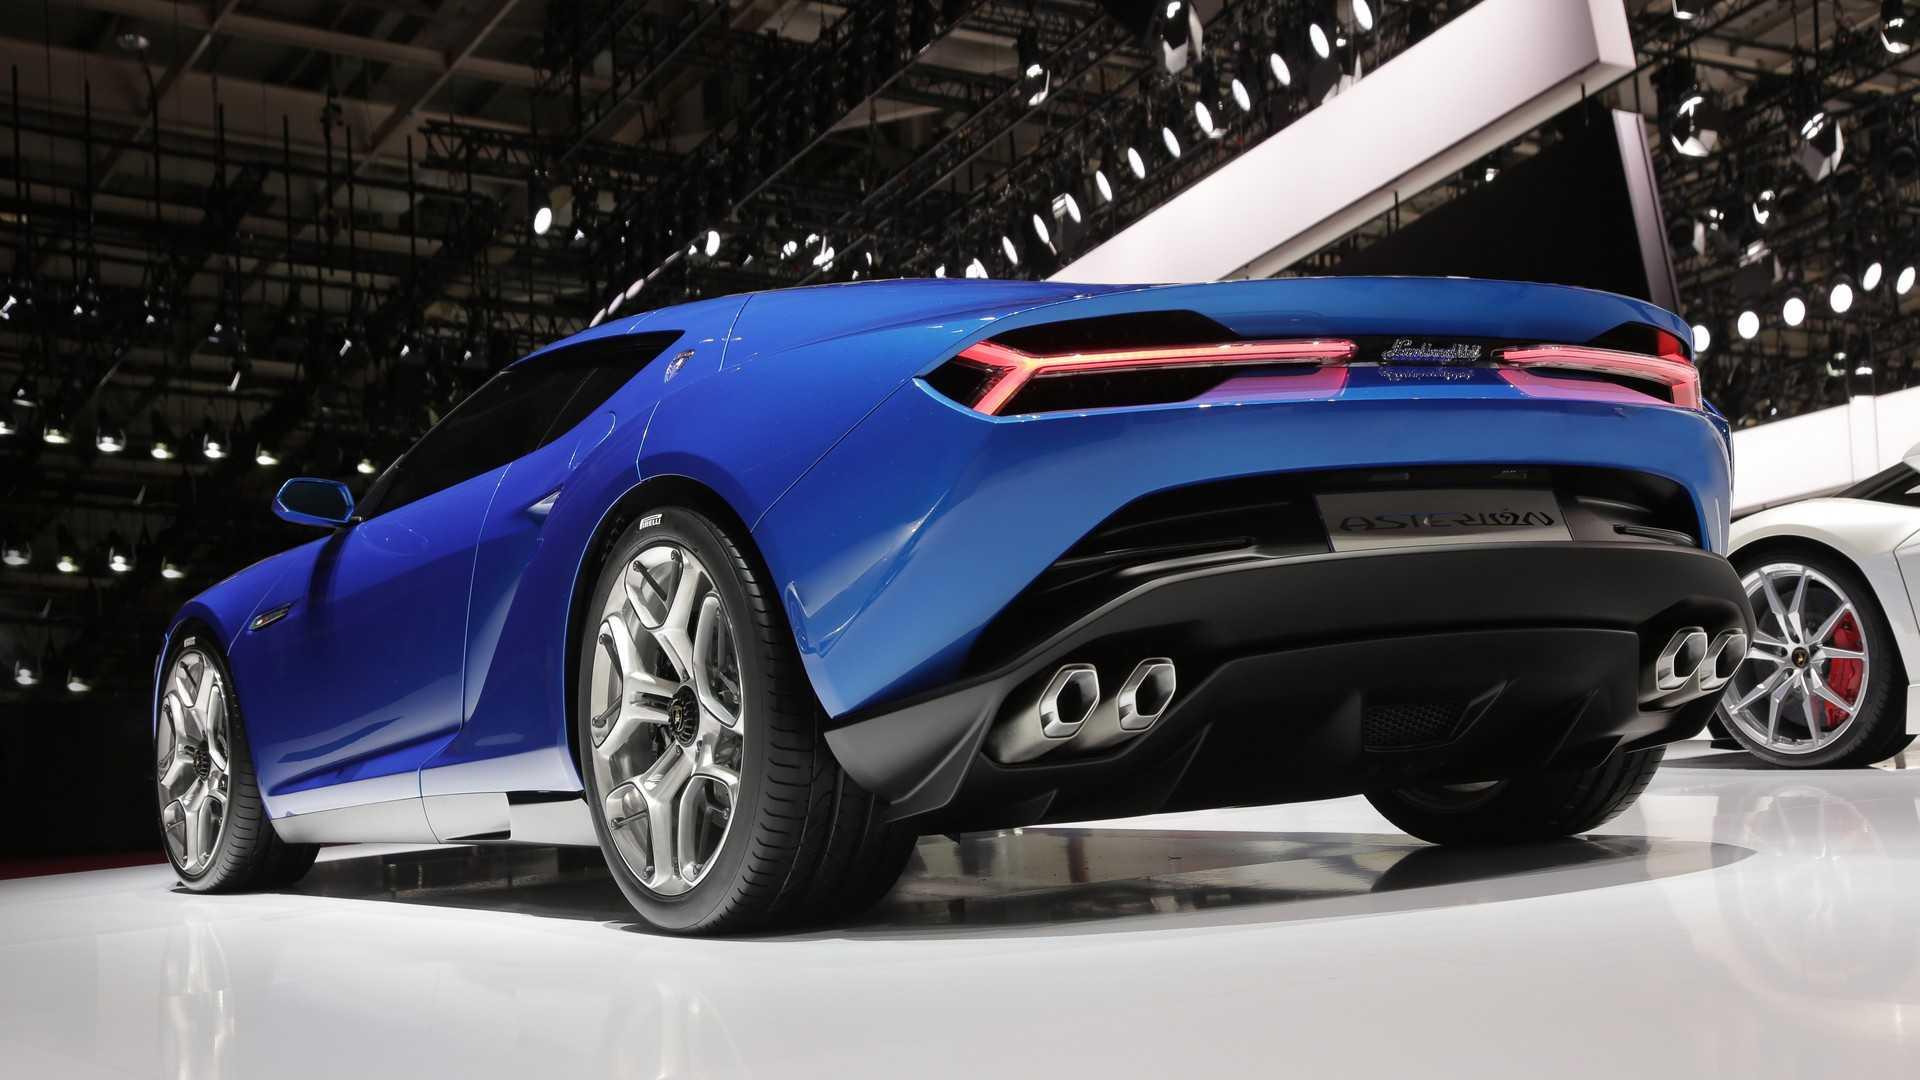 Lamborghini Asterion: делали гибрид, получили гиперкар 2